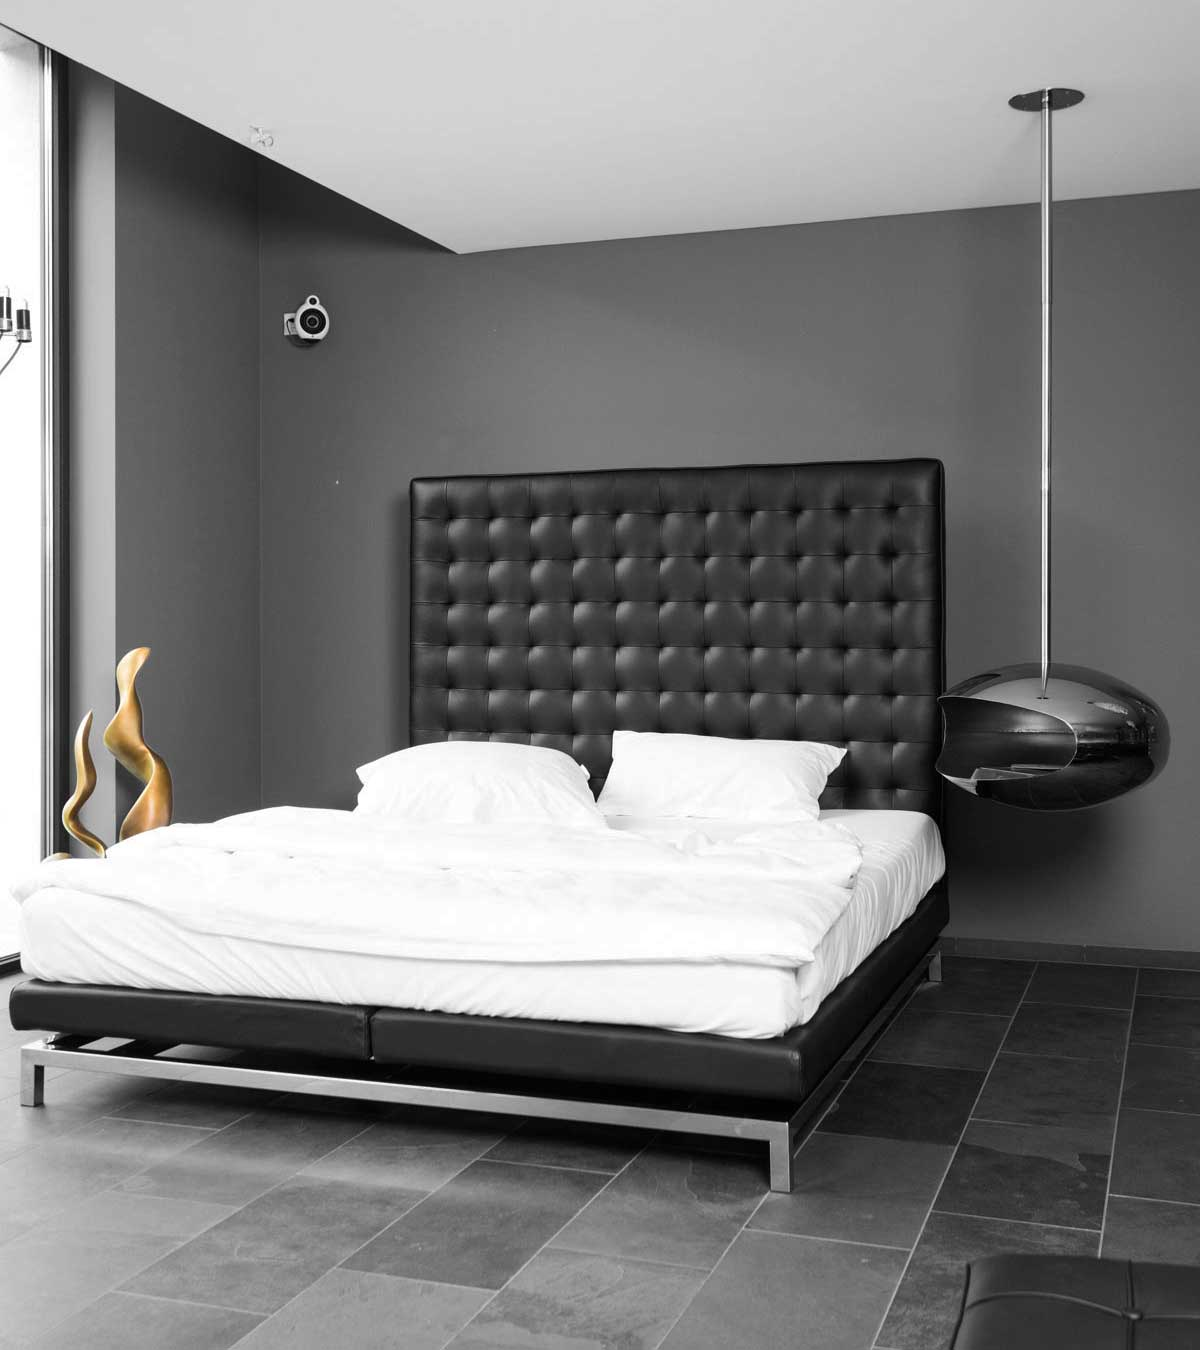 bett leder amazing neueste bett leder weiss finest. Black Bedroom Furniture Sets. Home Design Ideas